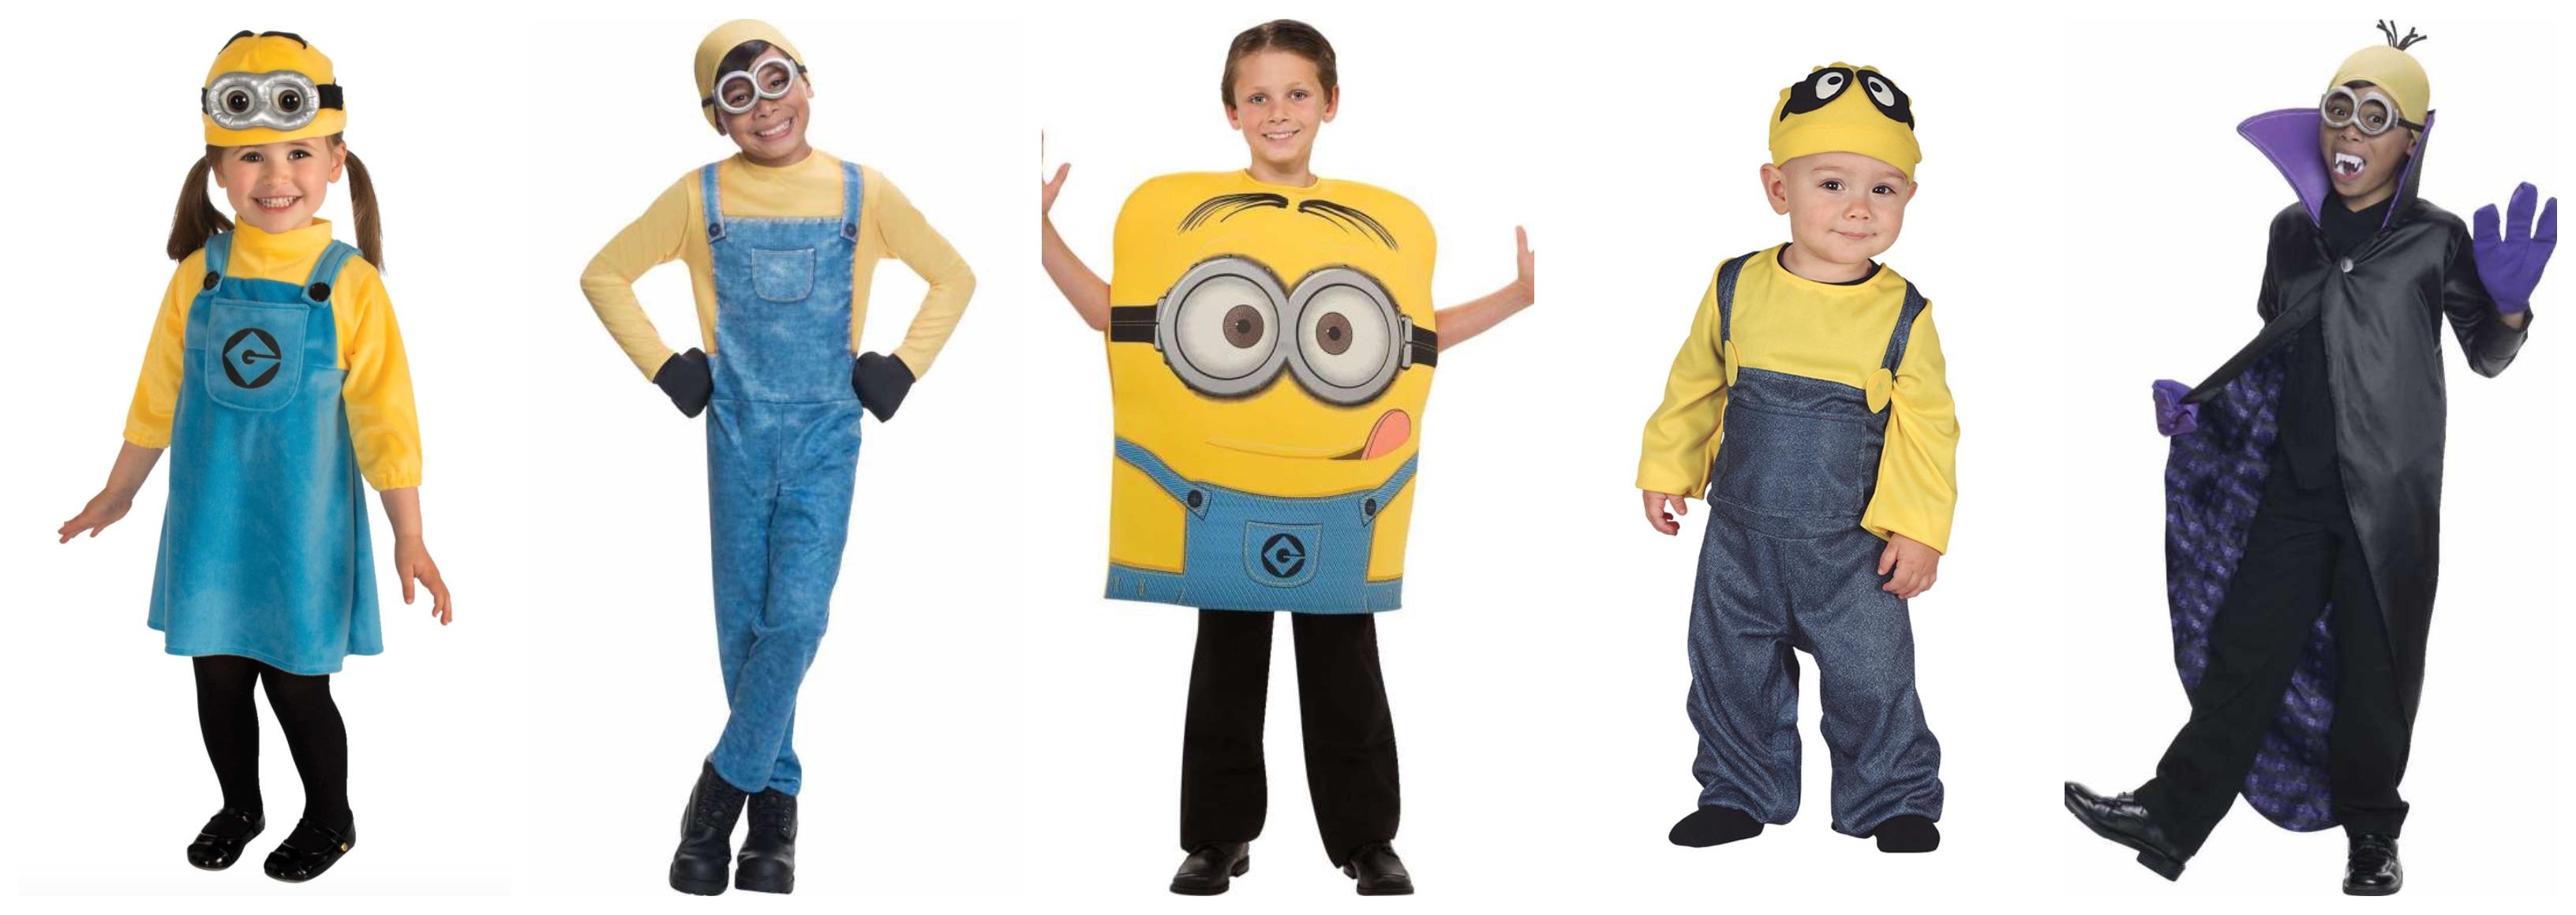 minions kostume til børn - Minions kostume til børn